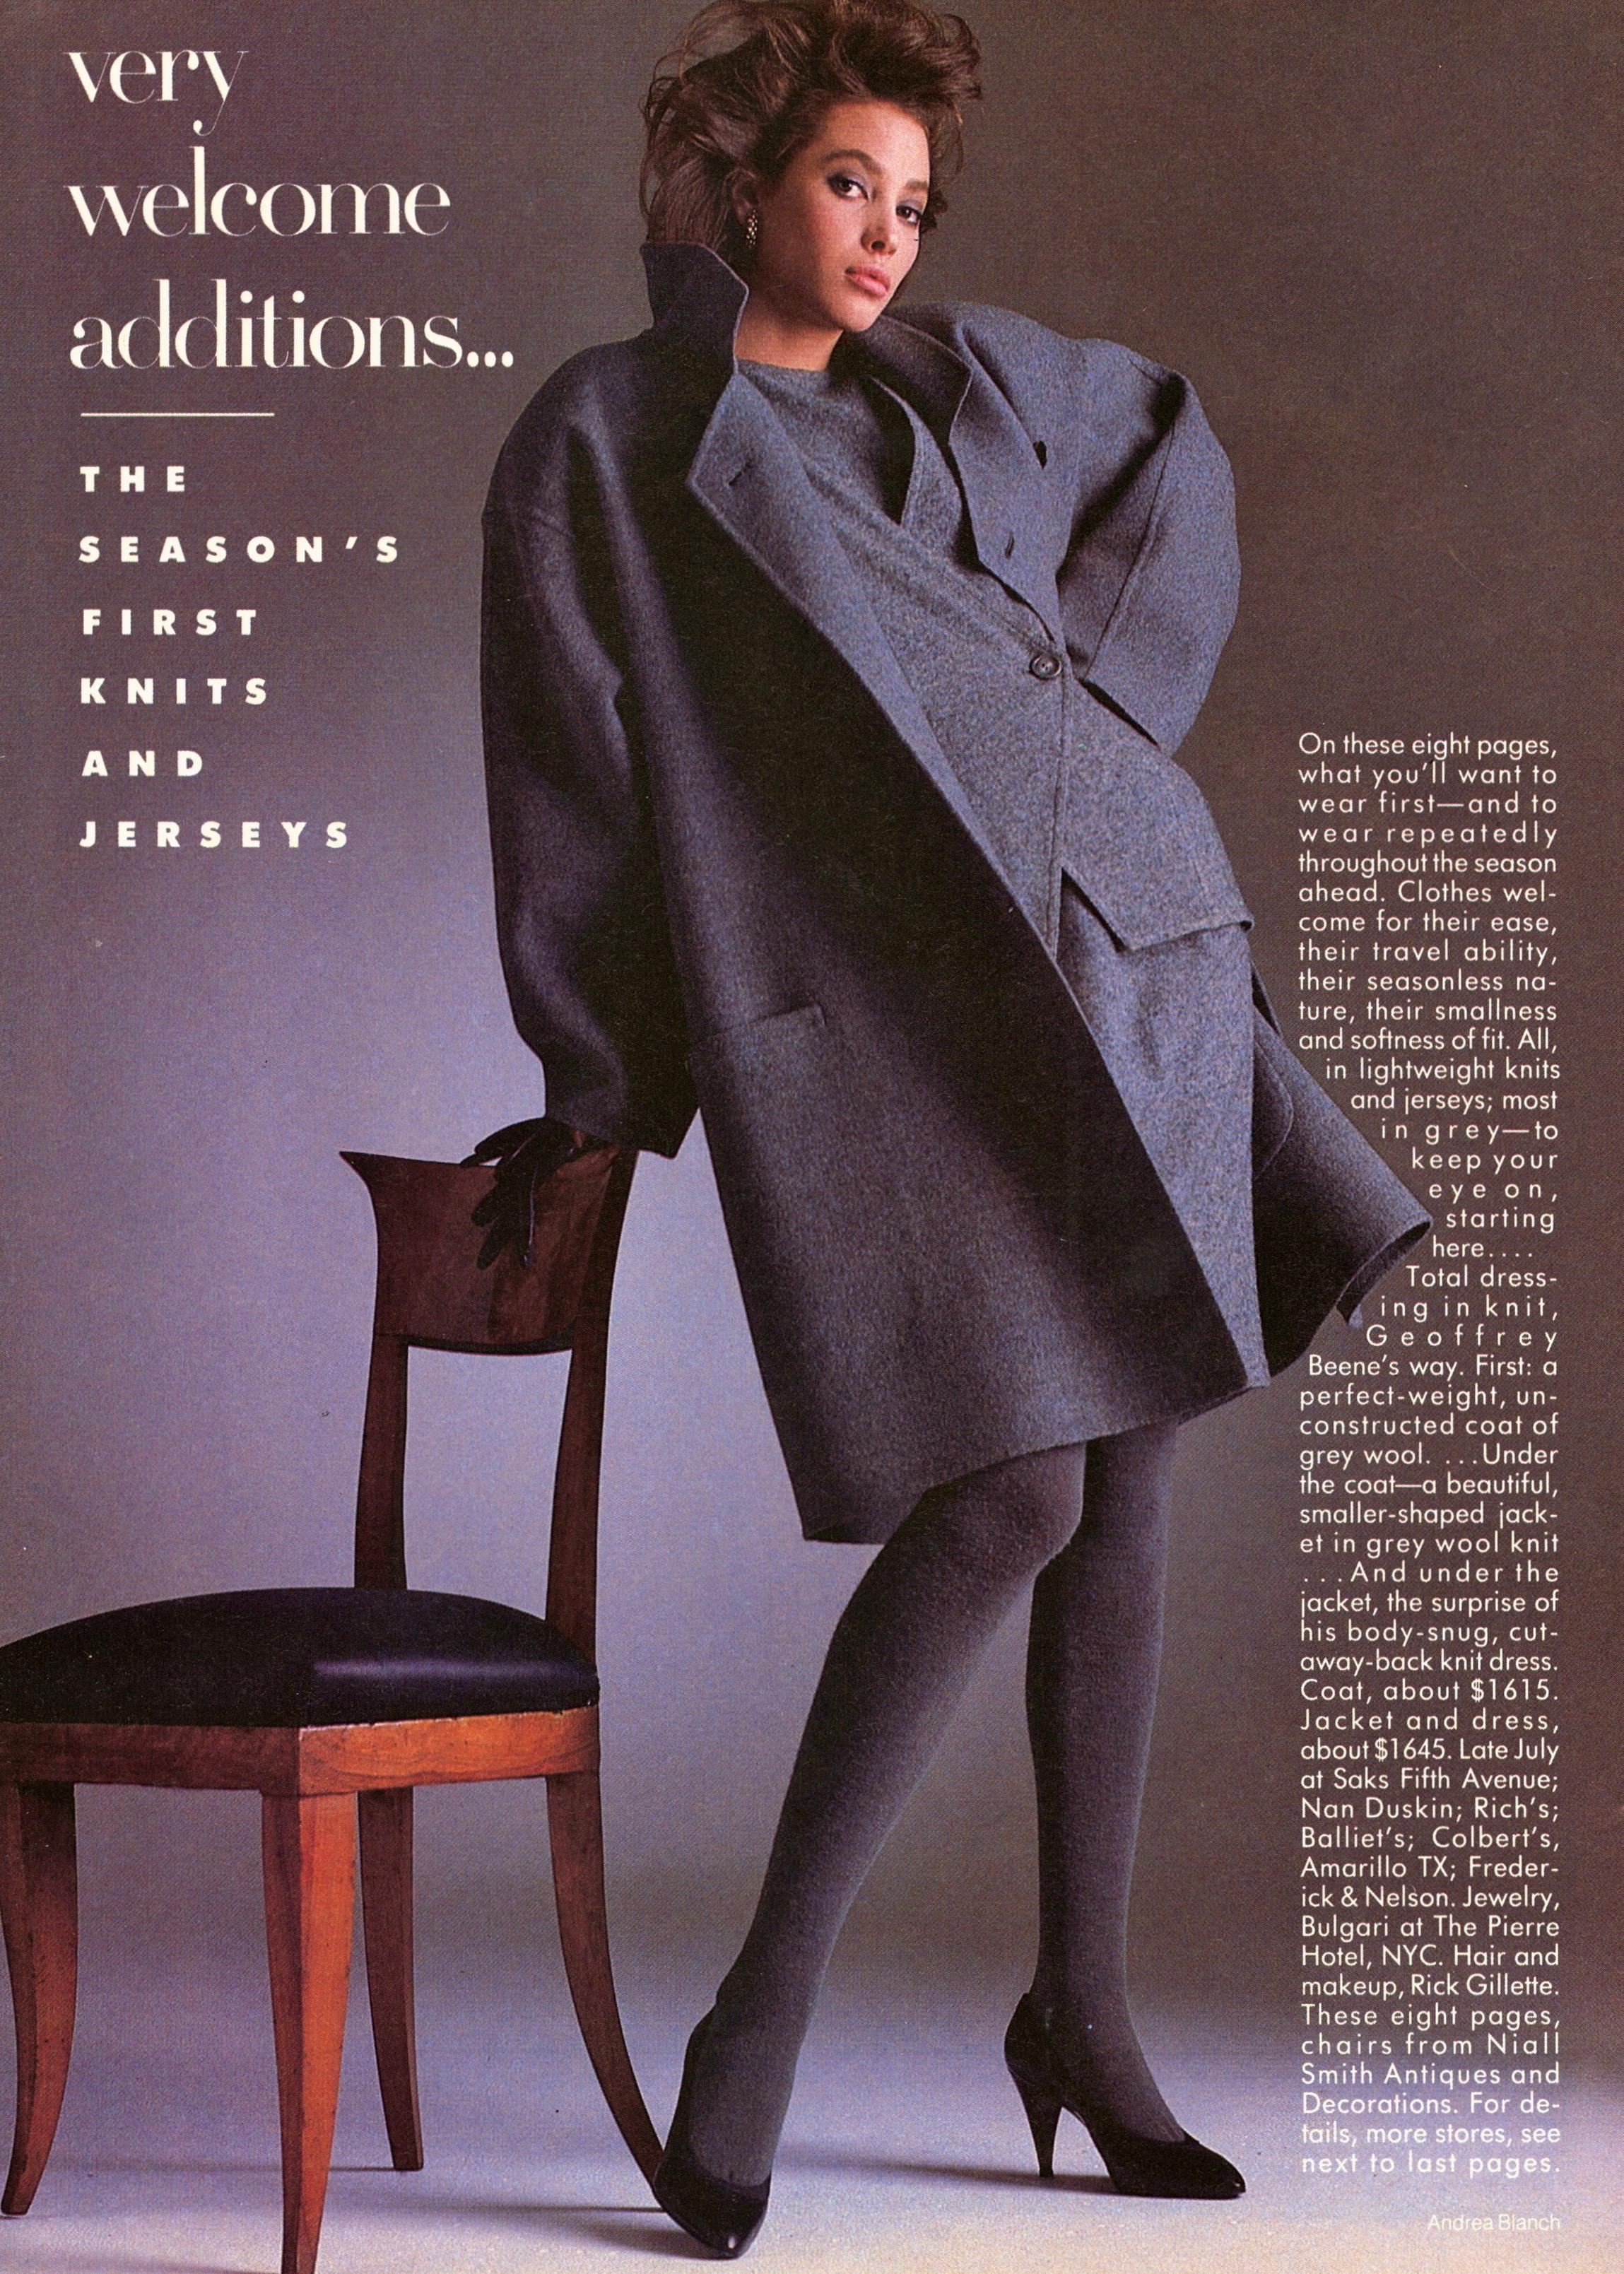 Vogue (US) June 1986 | Christy Turlington & Jose Toledo 01.jpg